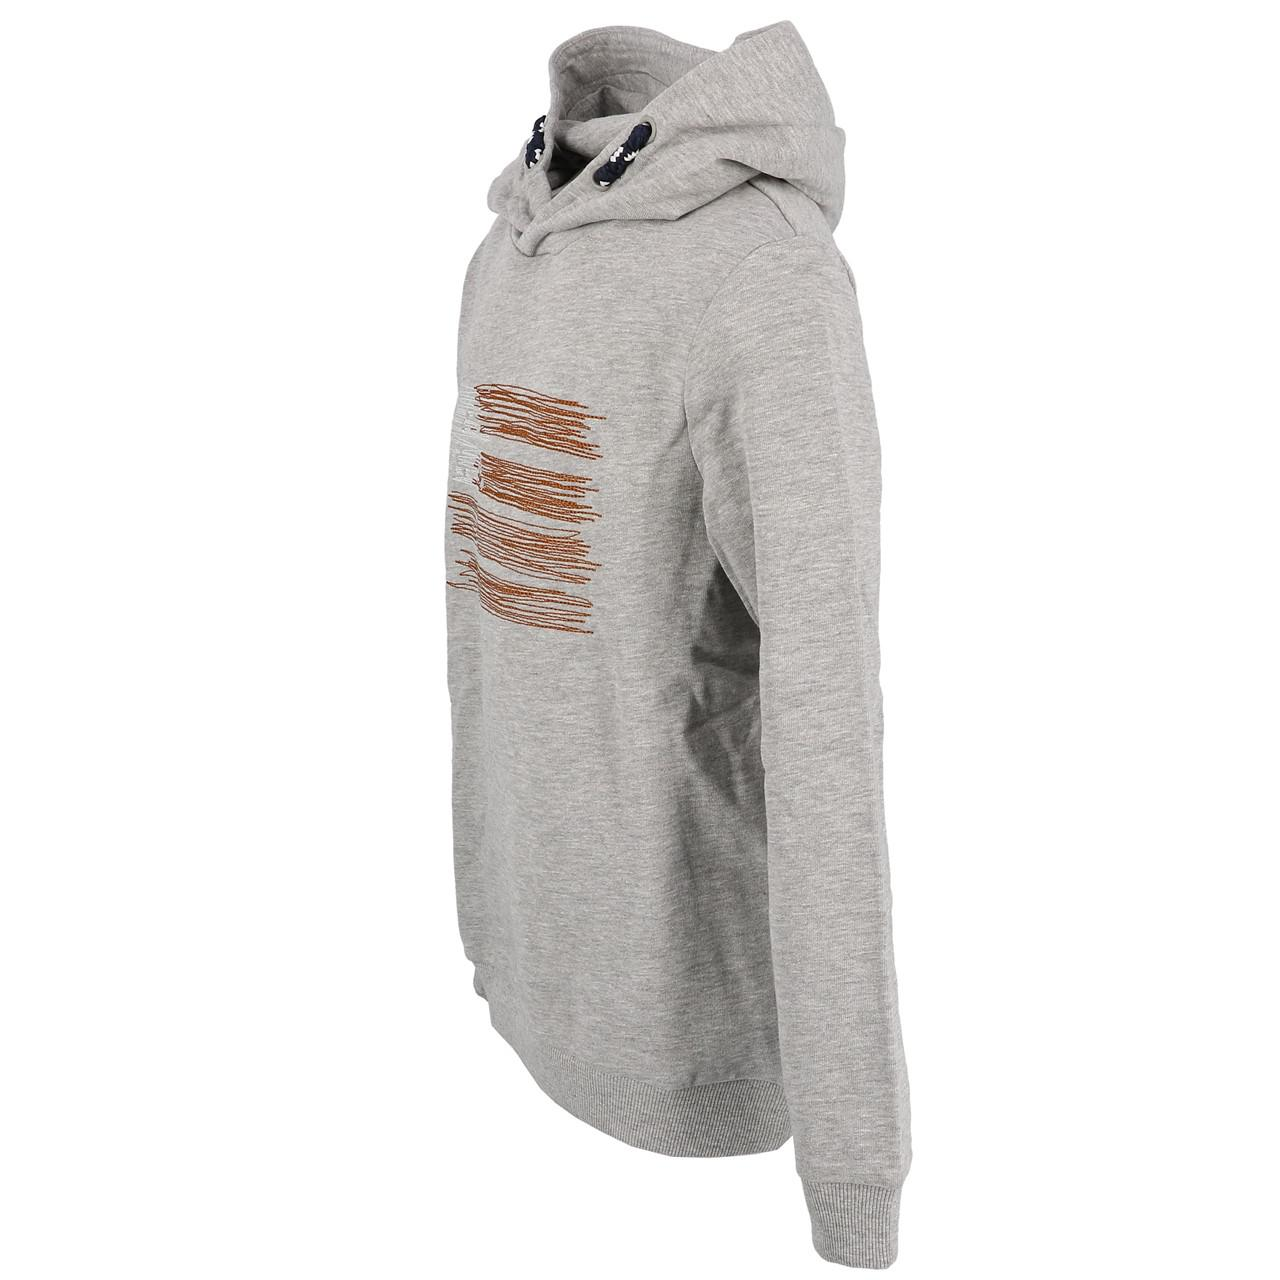 Sweatshirt-Kapuze-Kapuzenpulli-Name-It-Opilo-Grau-Mel-Sw-Jr-Grau-25908-Neu Indexbild 3